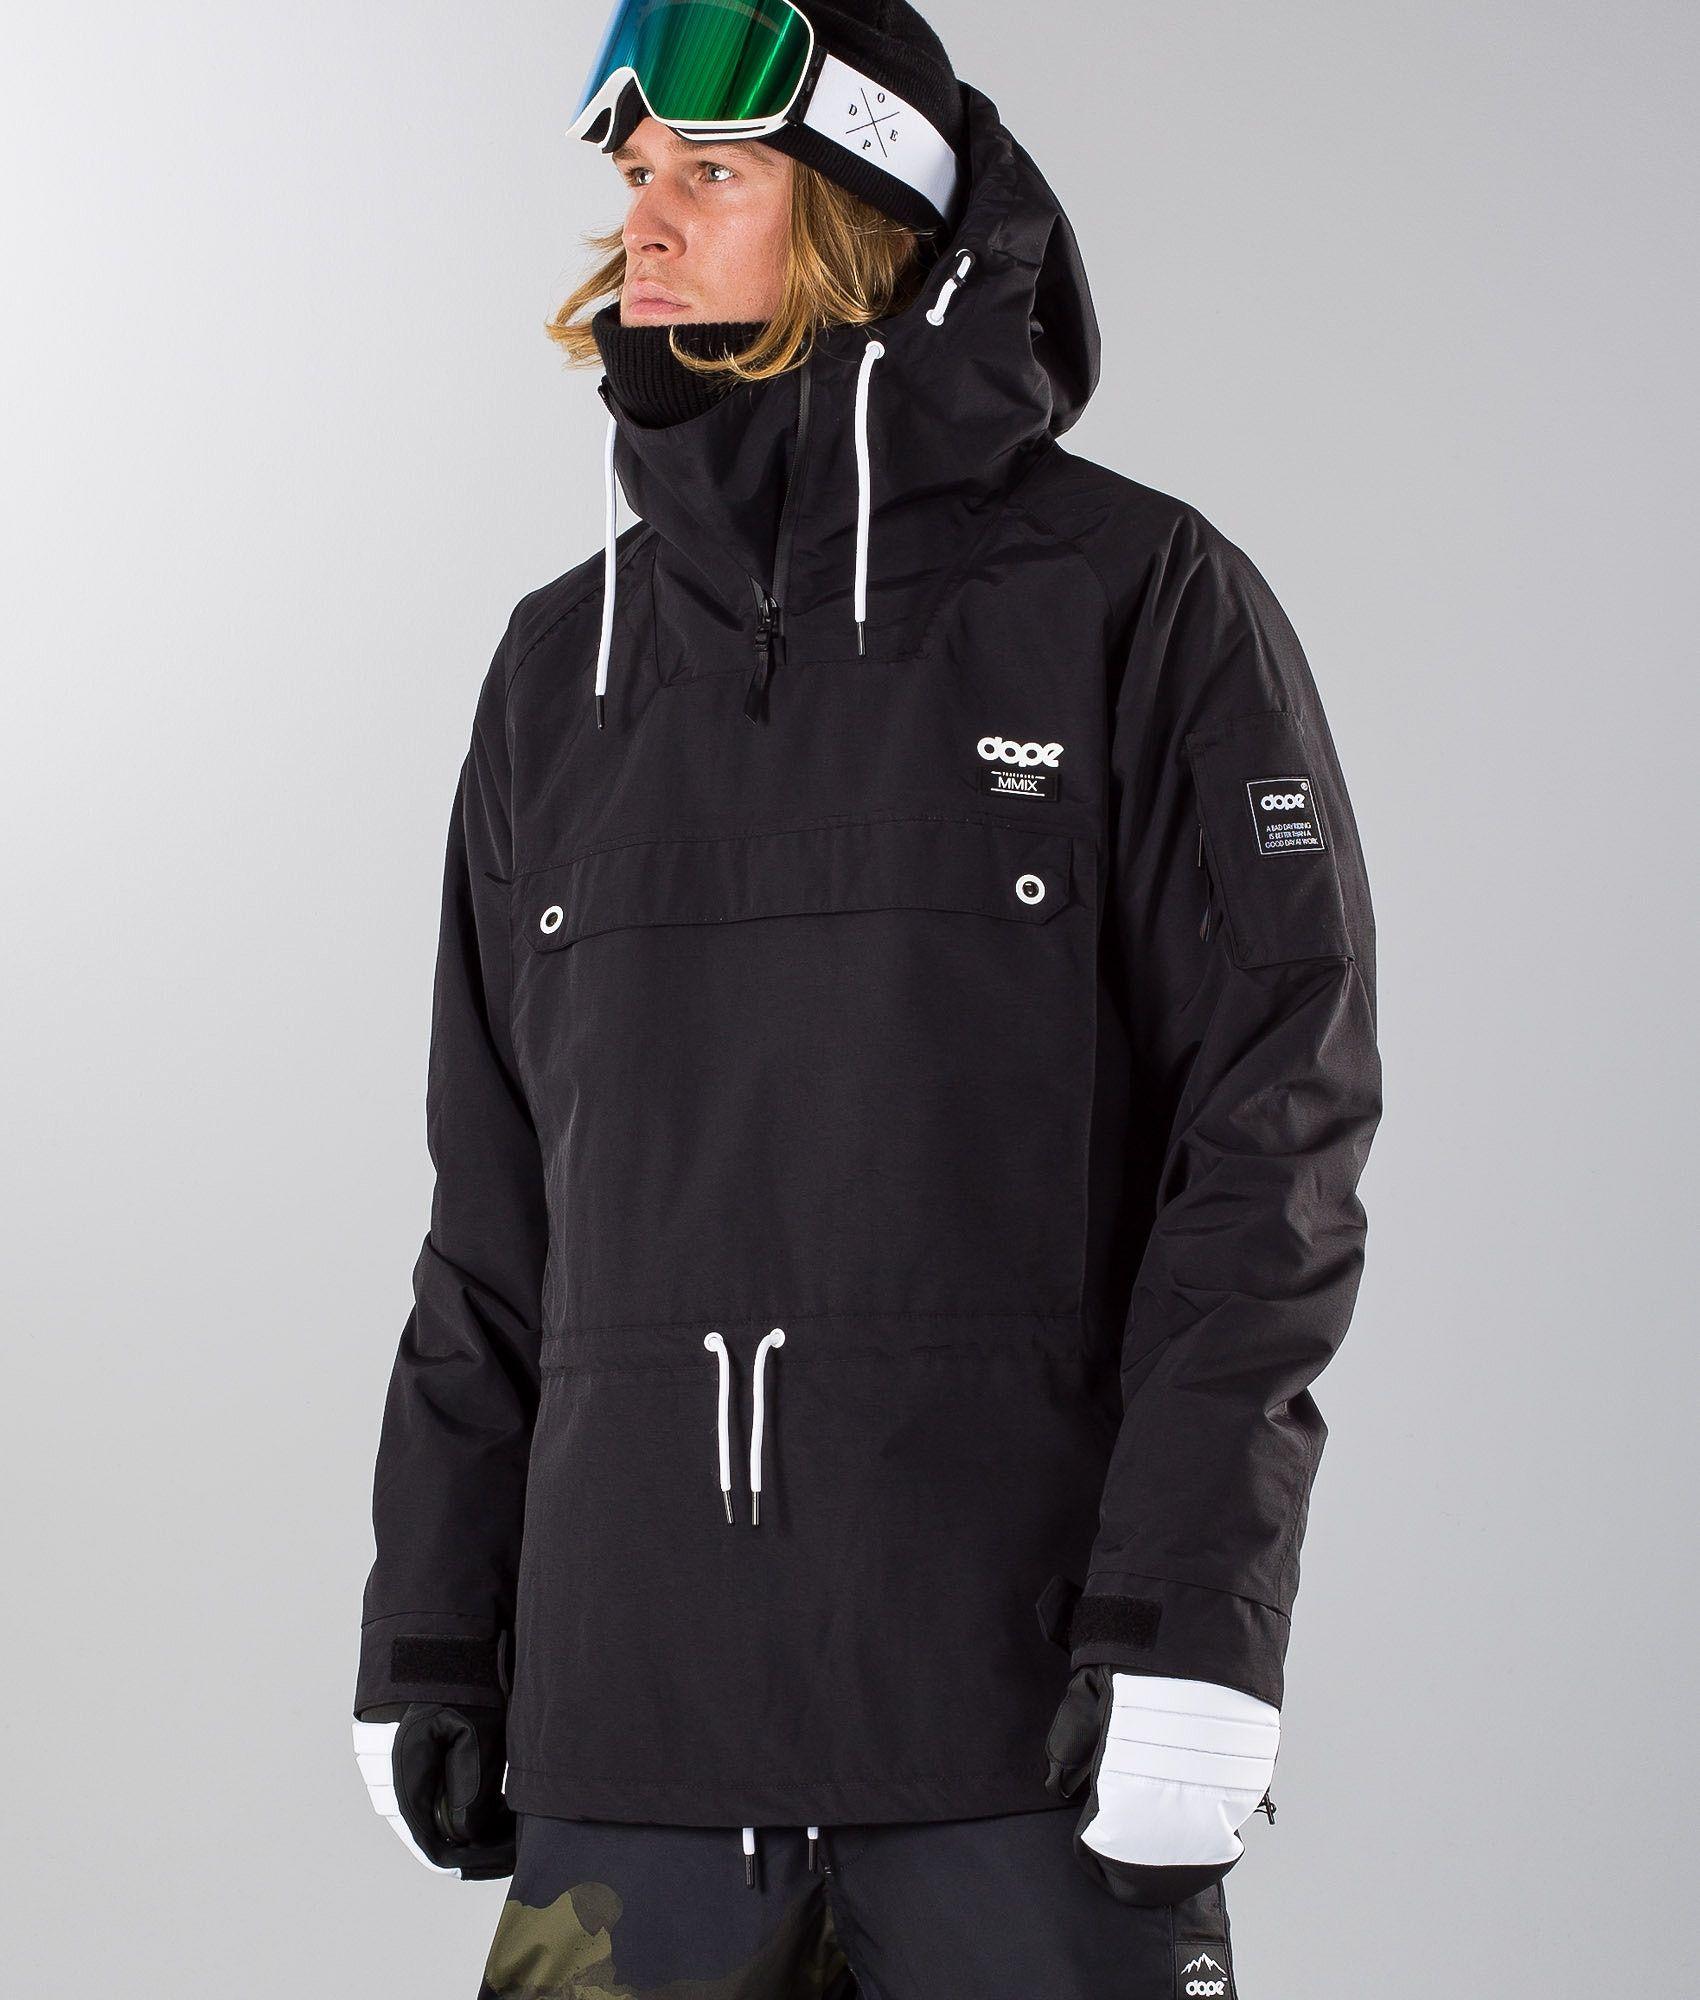 56e72ef74d snowboard gear mens ski outfit for men